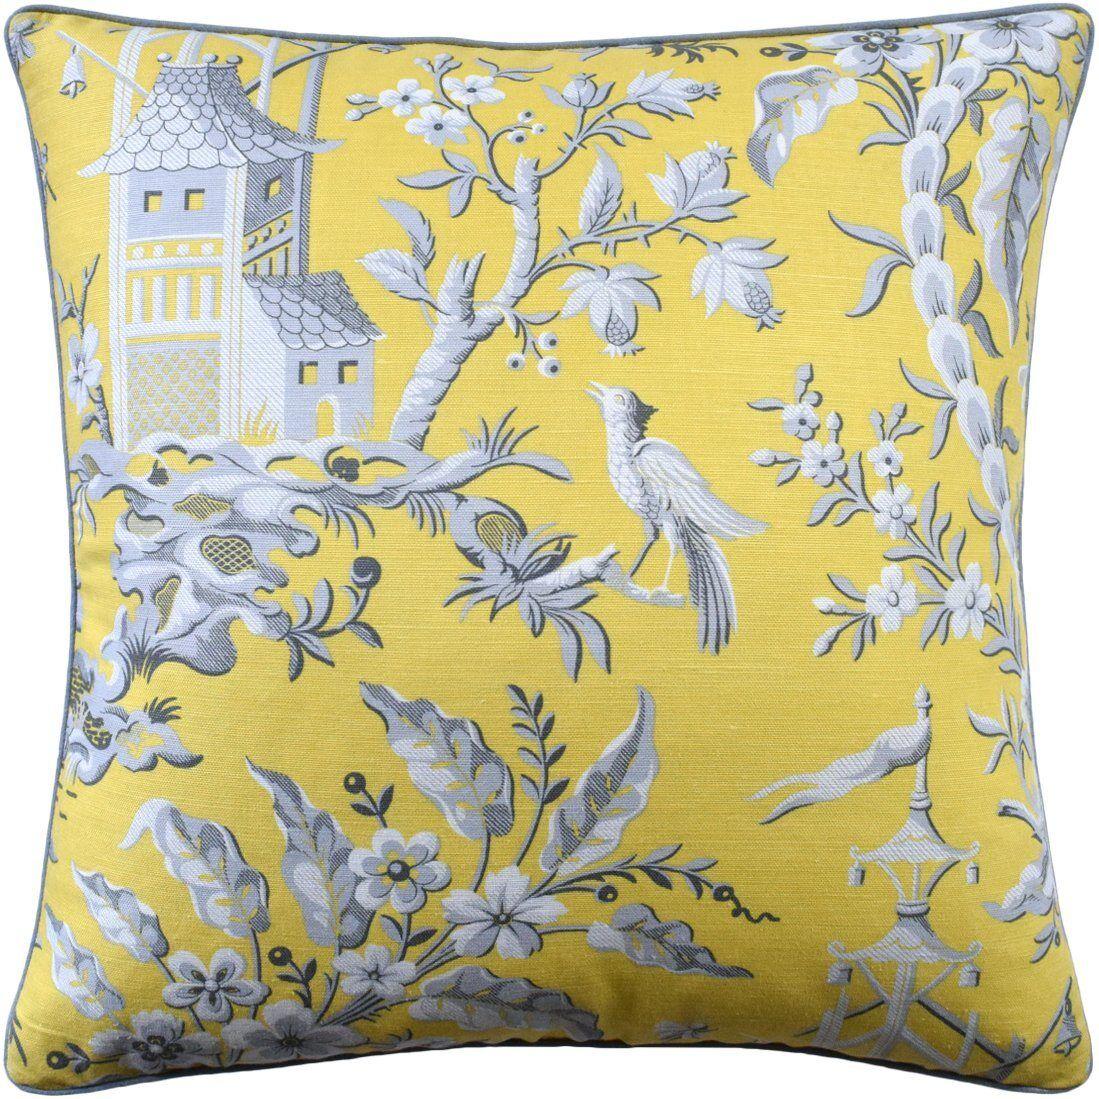 Ryan Studio Pagoda Garden Yellow Pillow